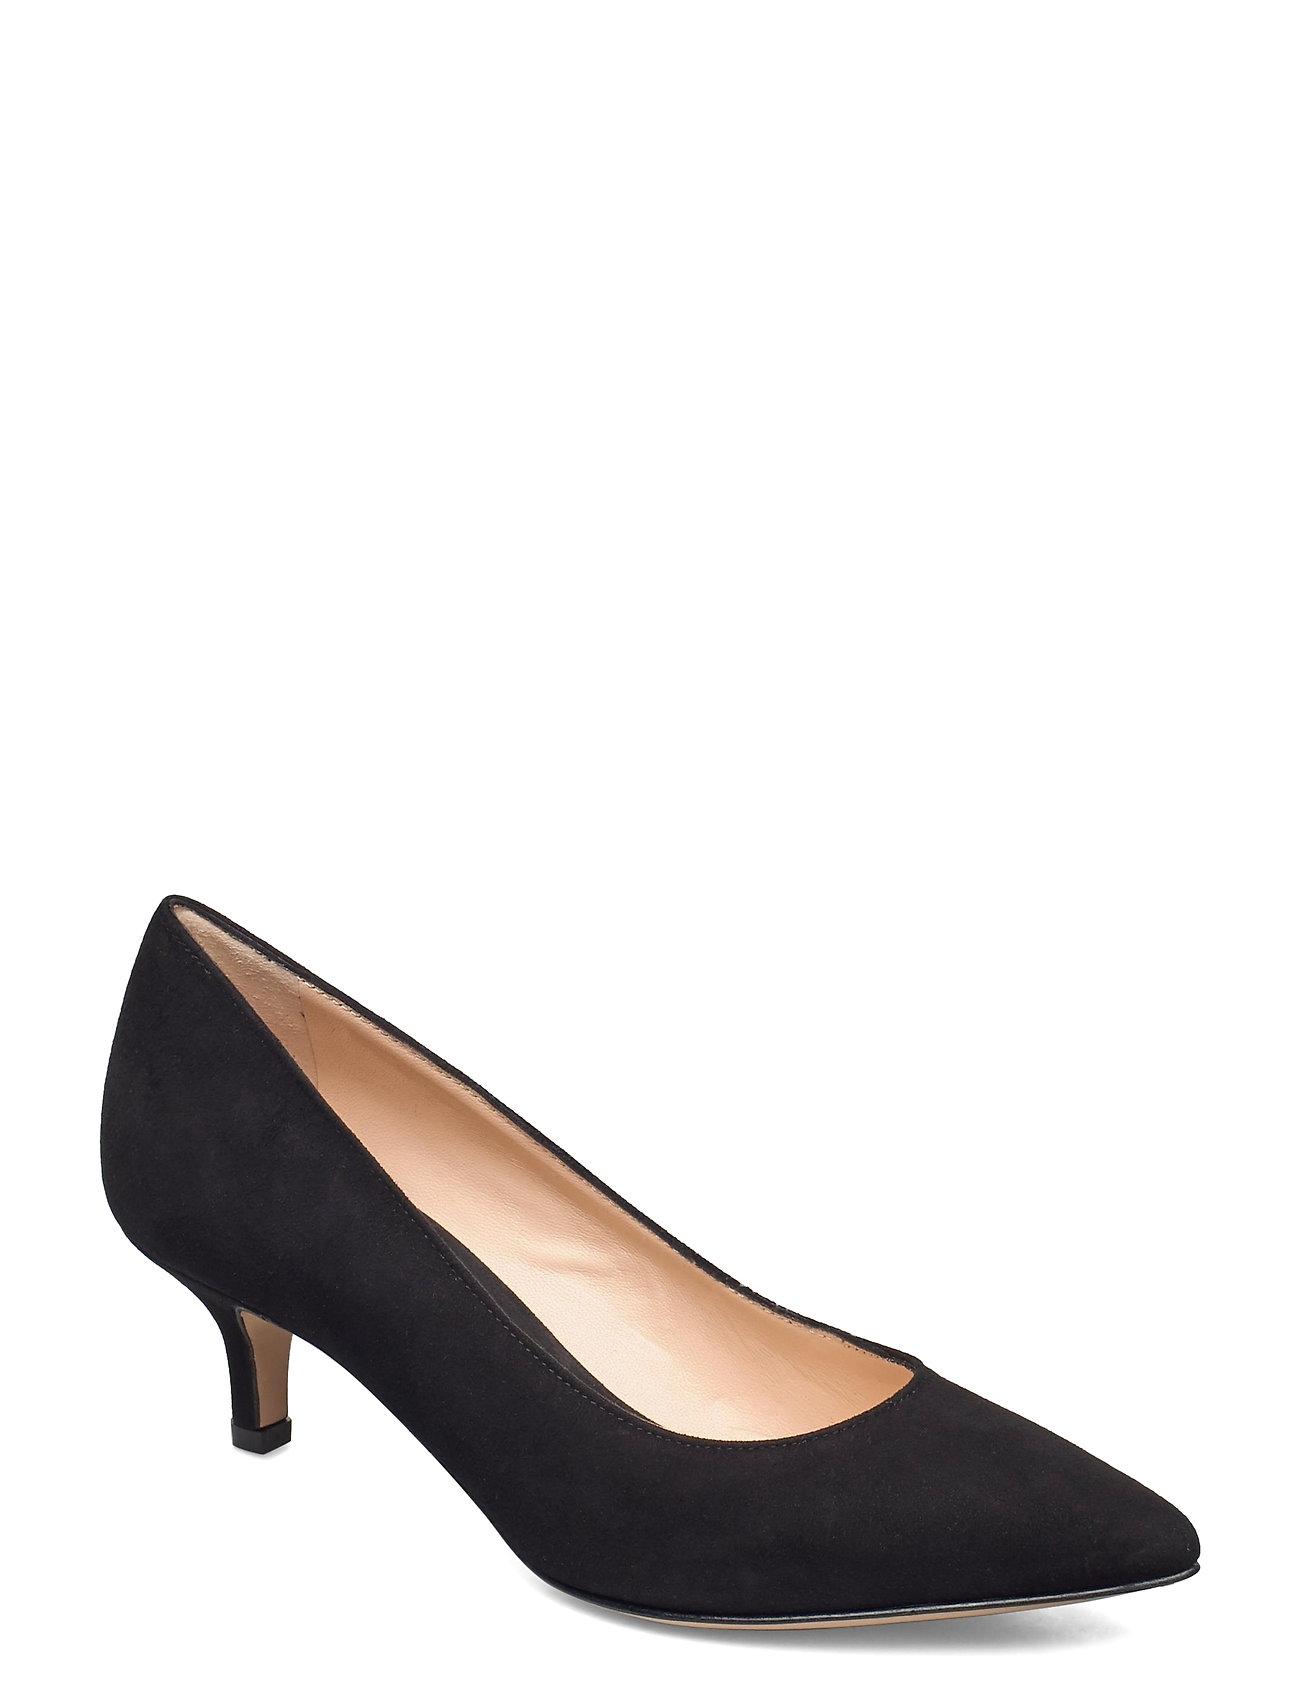 Image of Loui Shoes Heels Pumps Classic Sort Jennie-Ellen (3475360663)